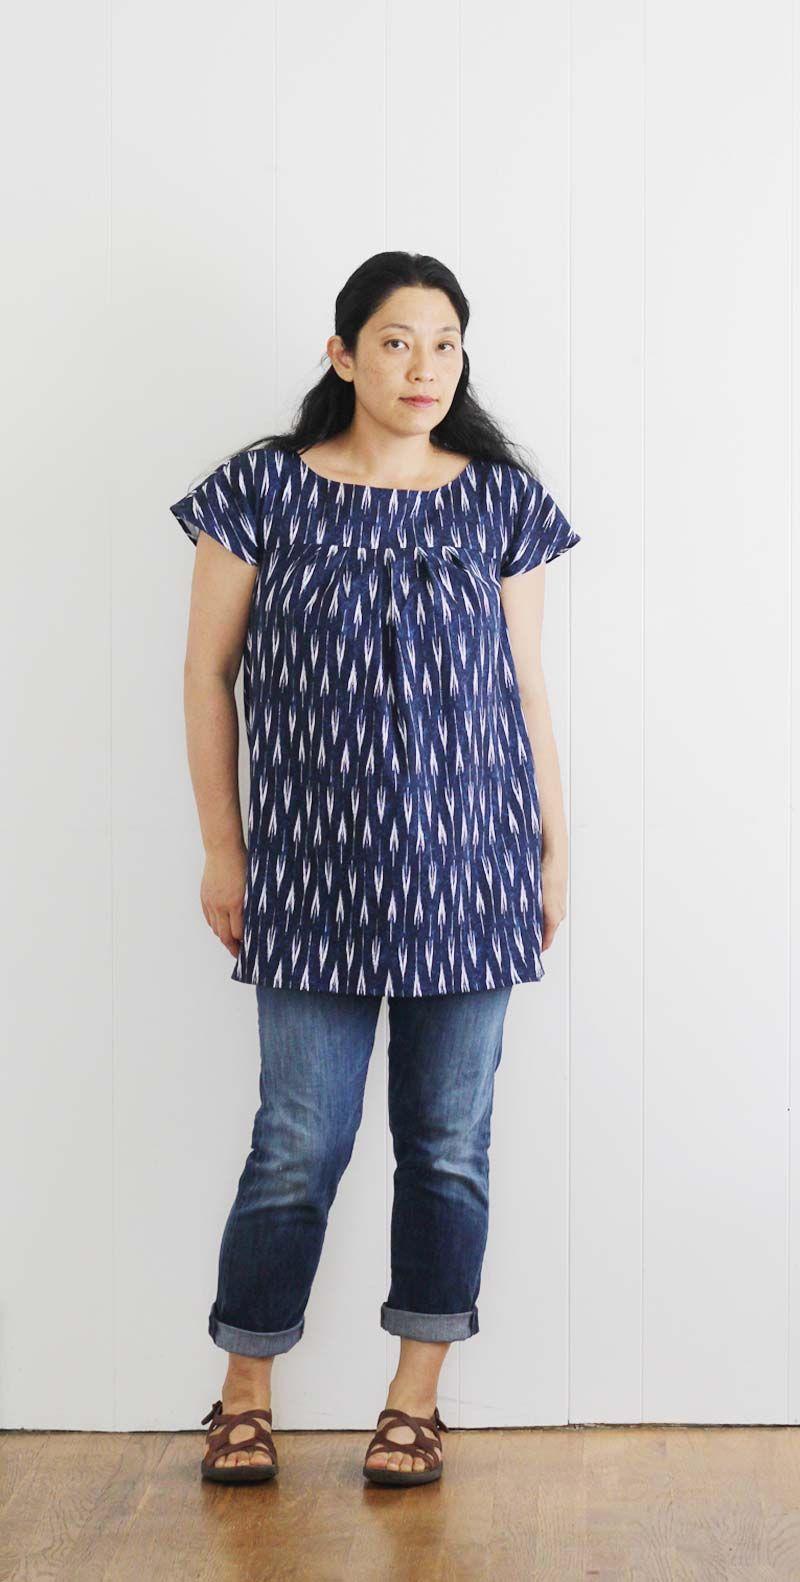 Sewing for Me: Simplicity 0403 aka 2147 - Sanae Ishida